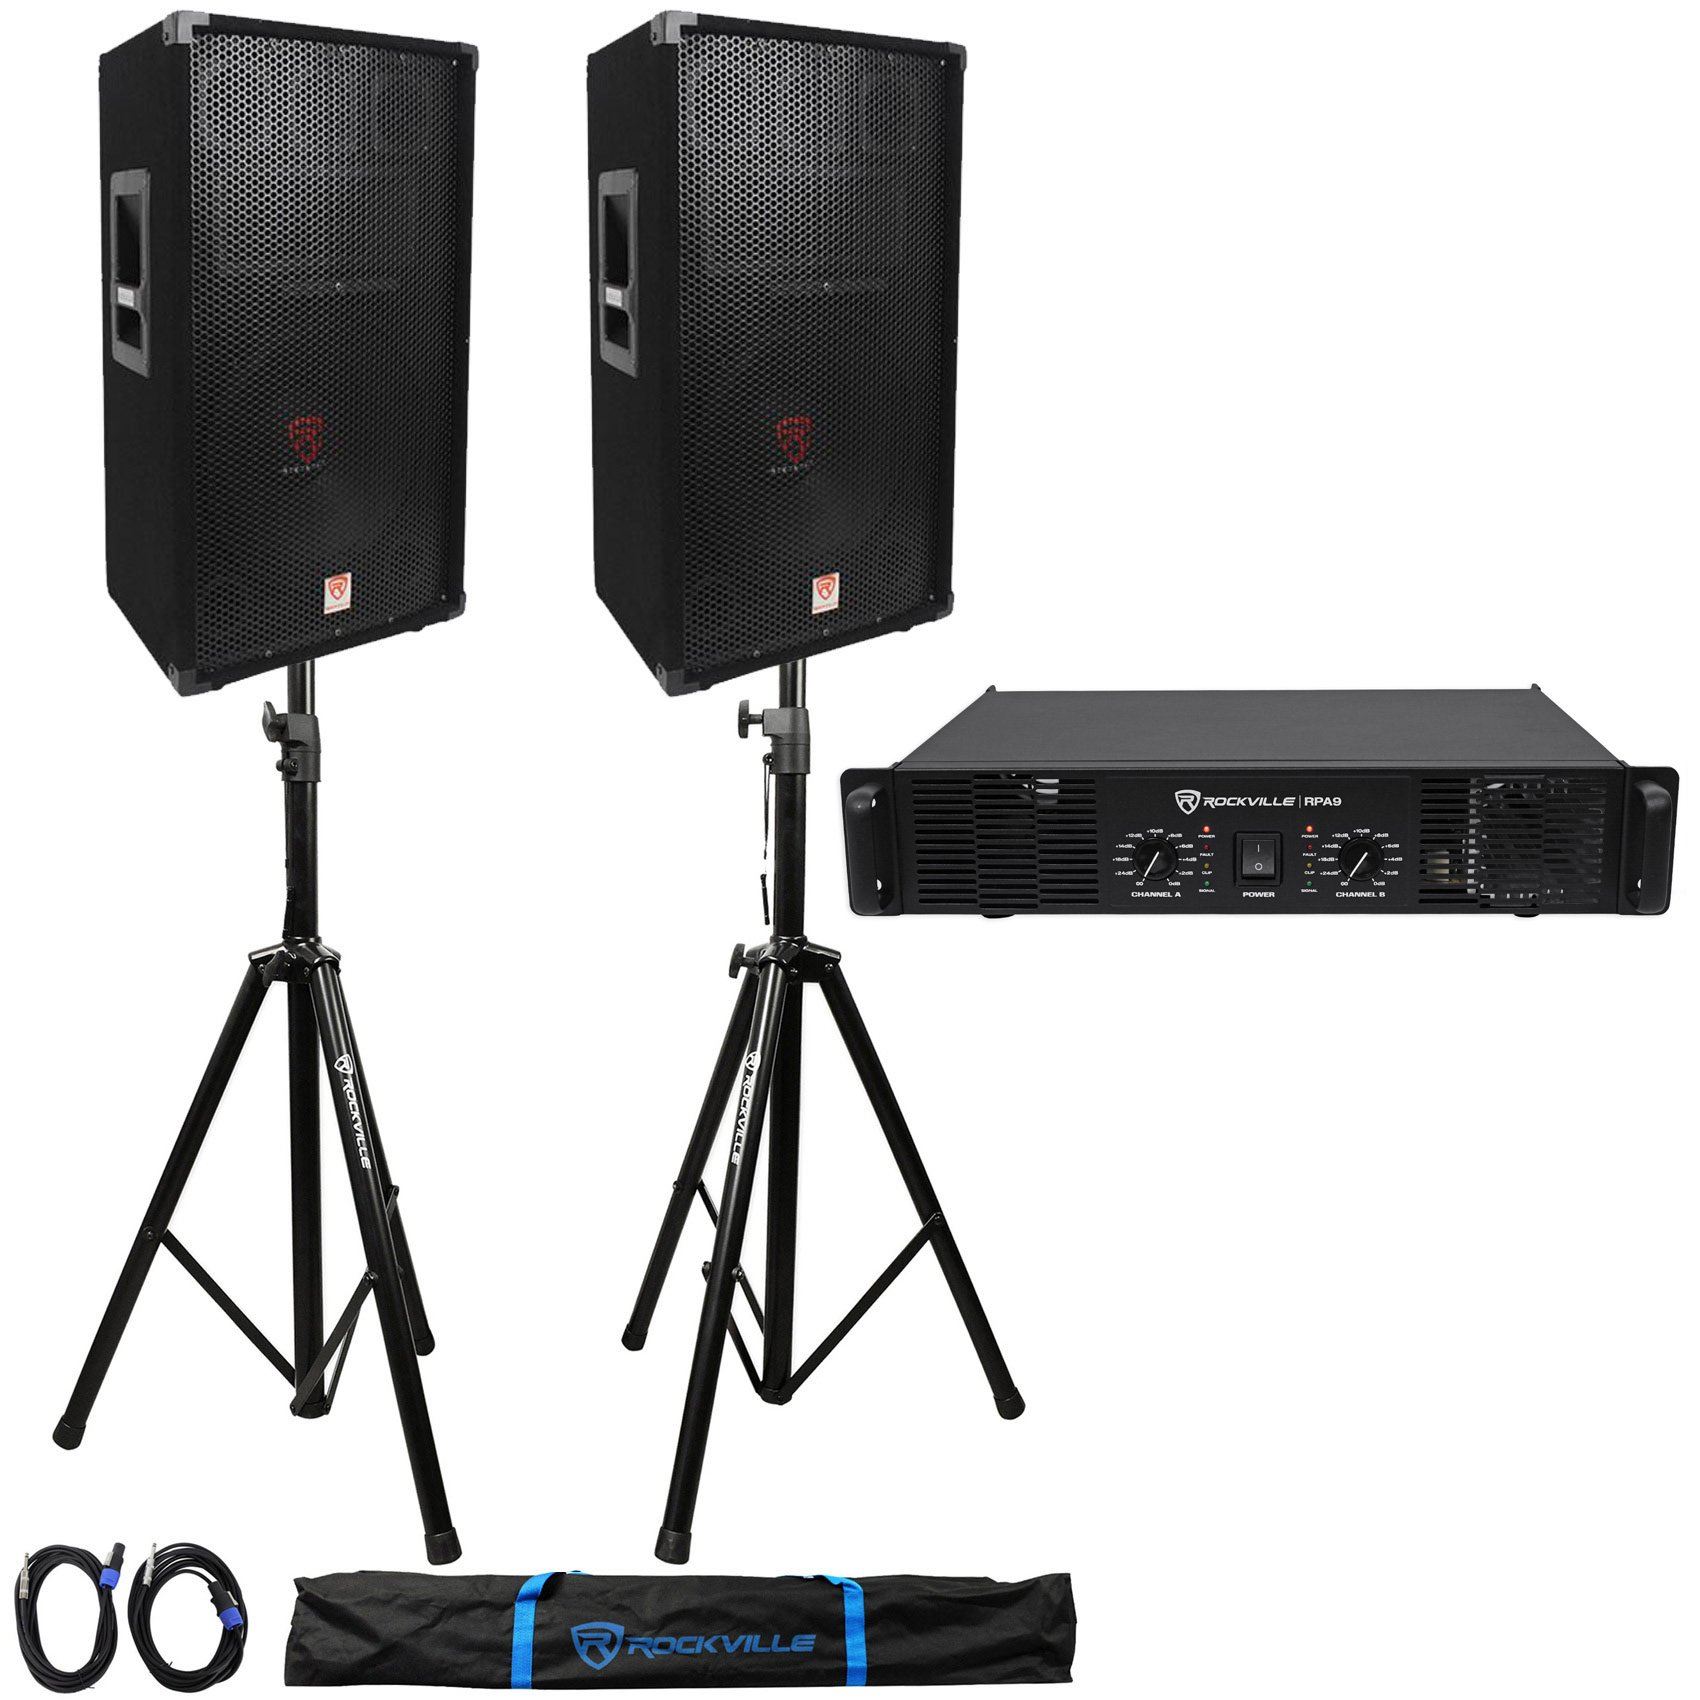 "Package: 2) Rockville RSG-12 Single 12"" 3-Way PA Loudspeakers Totaling 2000W + Rockville RPA8 3000W 2-Channel DJ Power Amplifier + Pair of Rockville RVSS2-TSNL4 Heavy Duty Adjustable Pro PA Speaker Stands + 2)1/4'' to SpeakOn NL-4 Cables + Carrying Case"